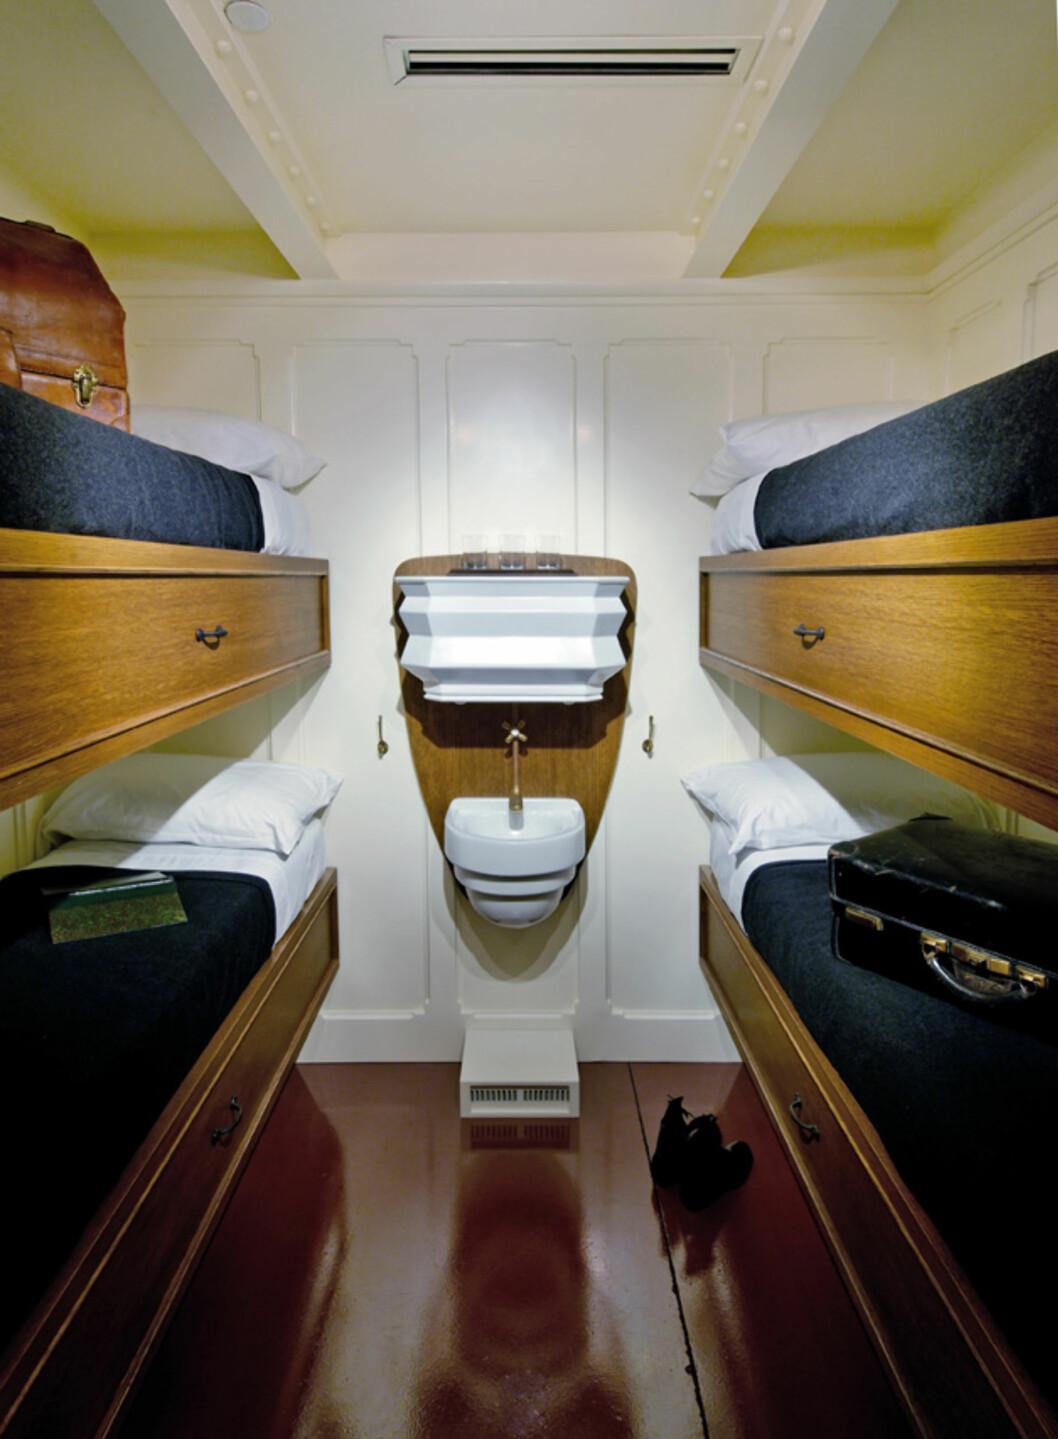 Slik så en trejdeklassekabin ut ombord Titanic. Foto: Titanic Pigeon Forge